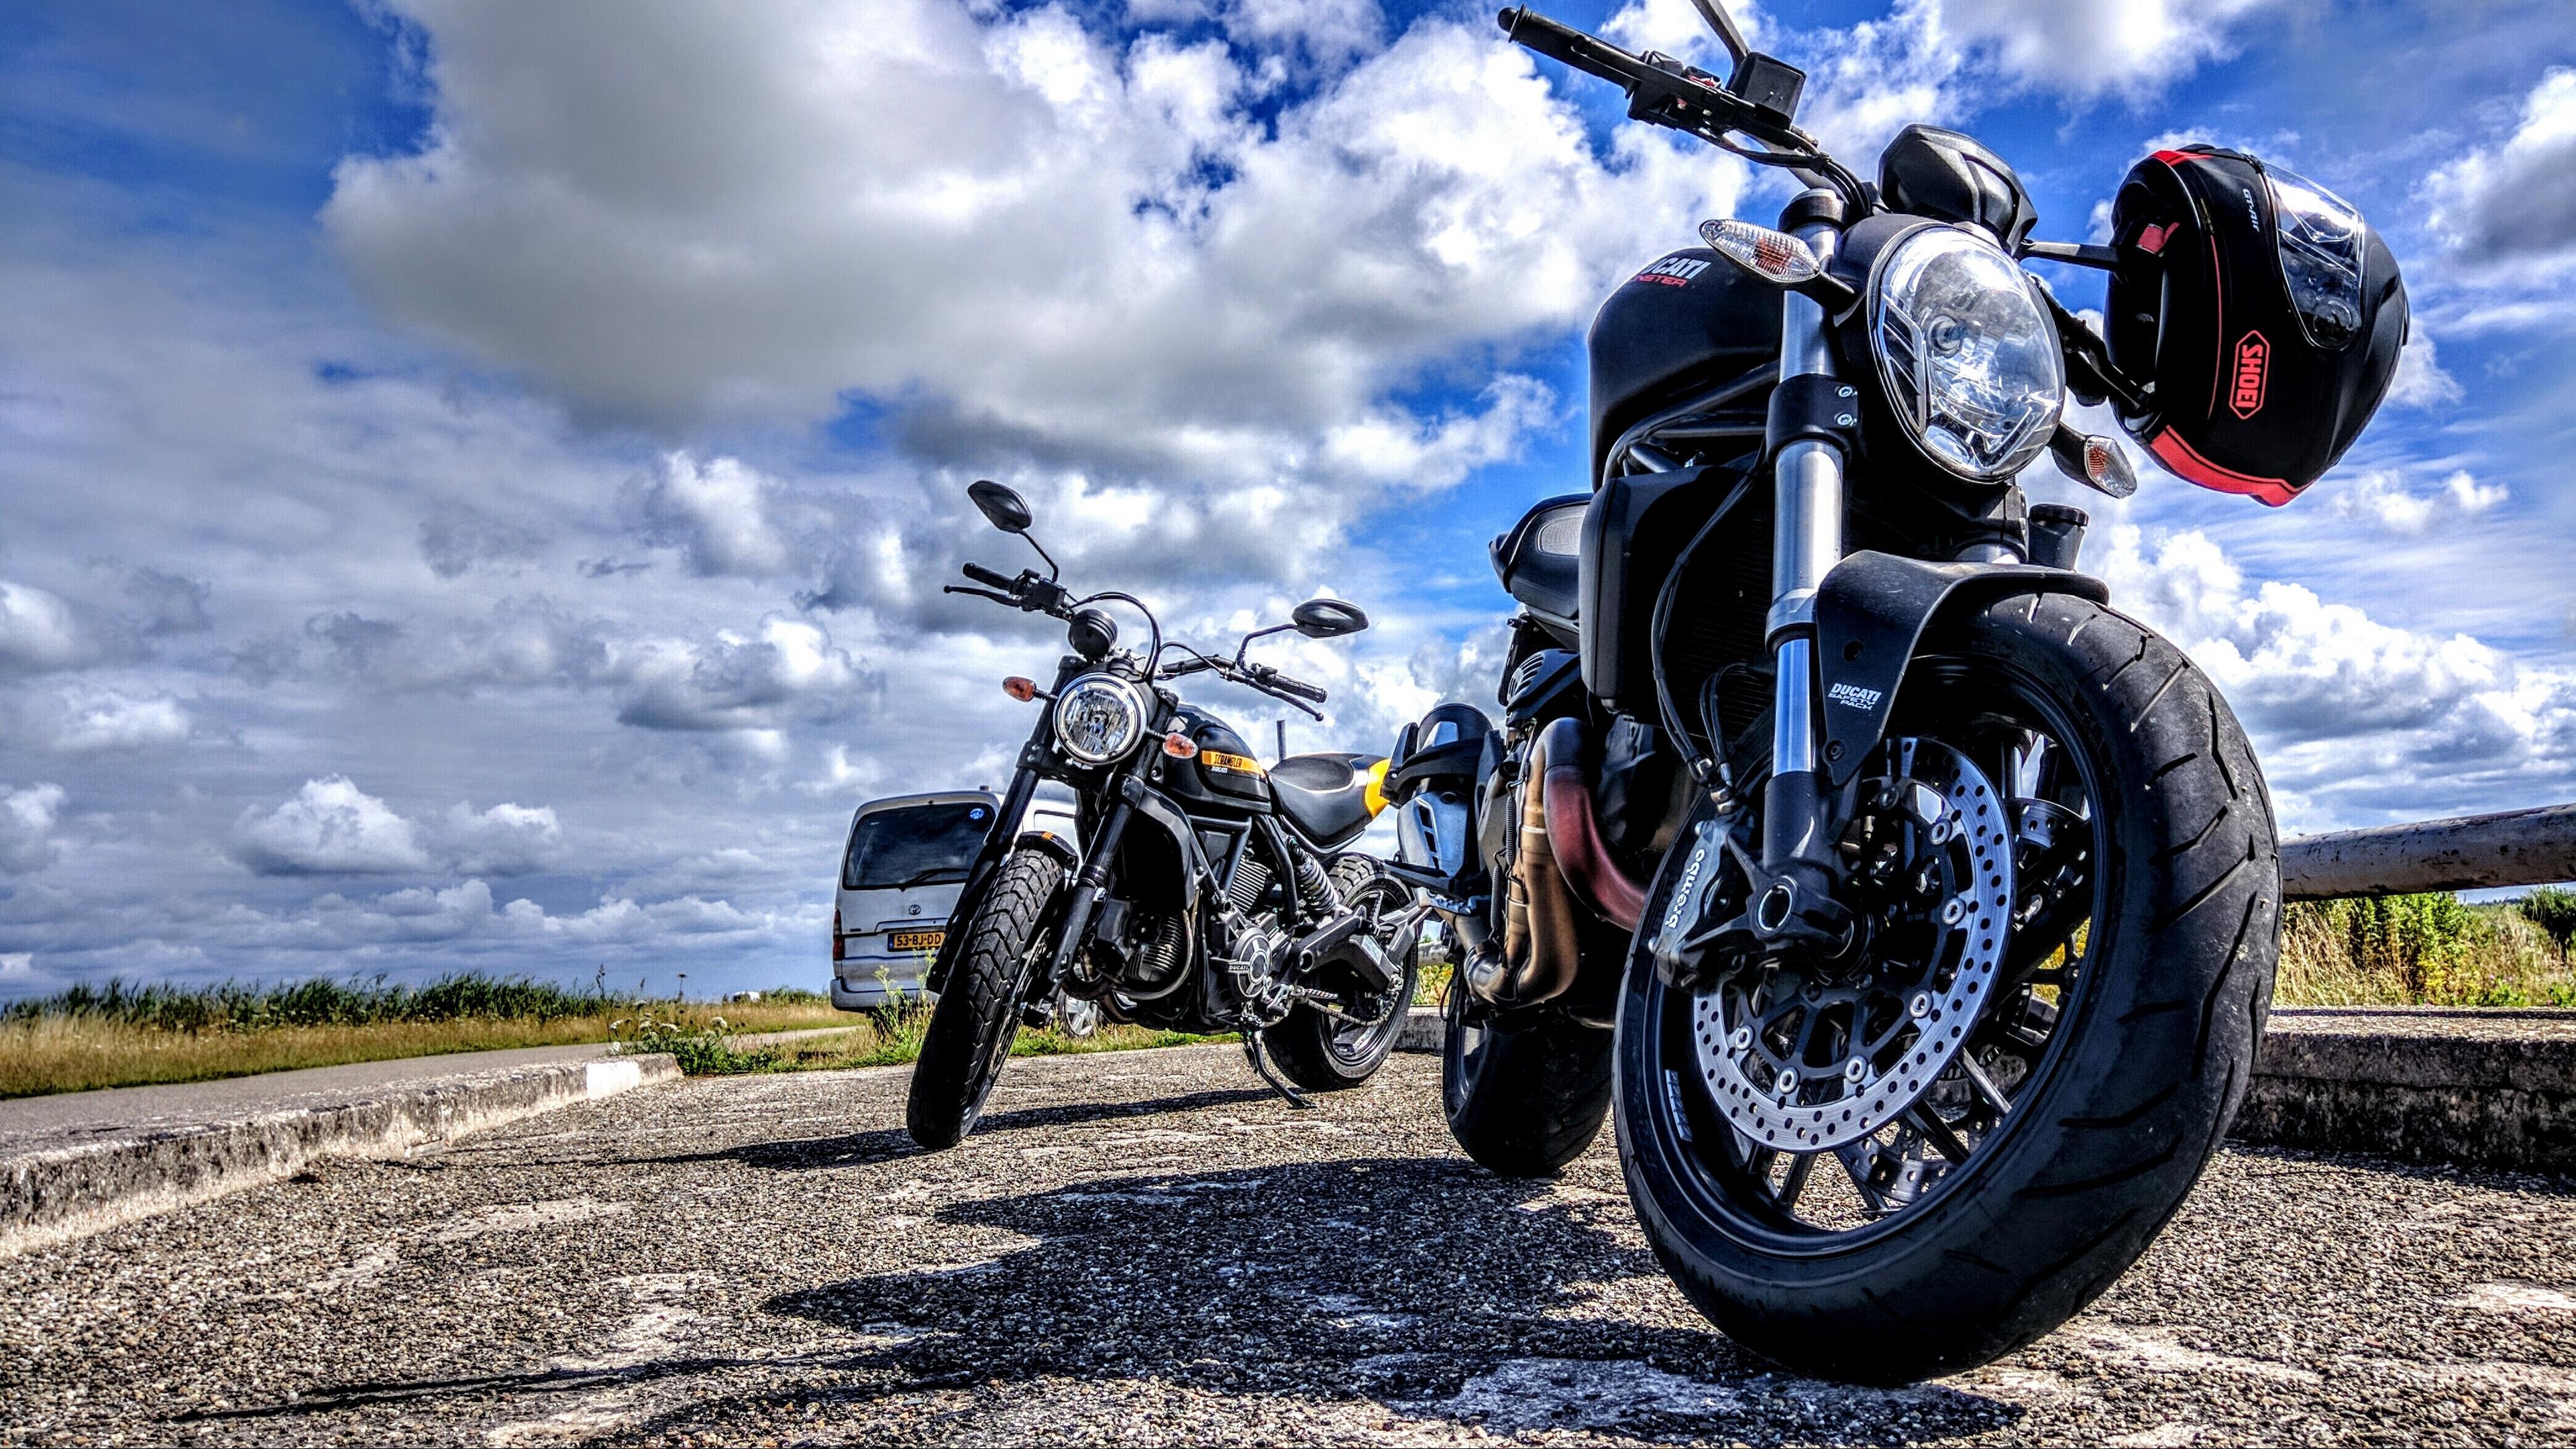 ducati motorcycle bike helmet motorcycling 4k 1536018365 - ducati, motorcycle, bike, helmet, motorcycling 4k - Motorcycle, Ducati, Bike